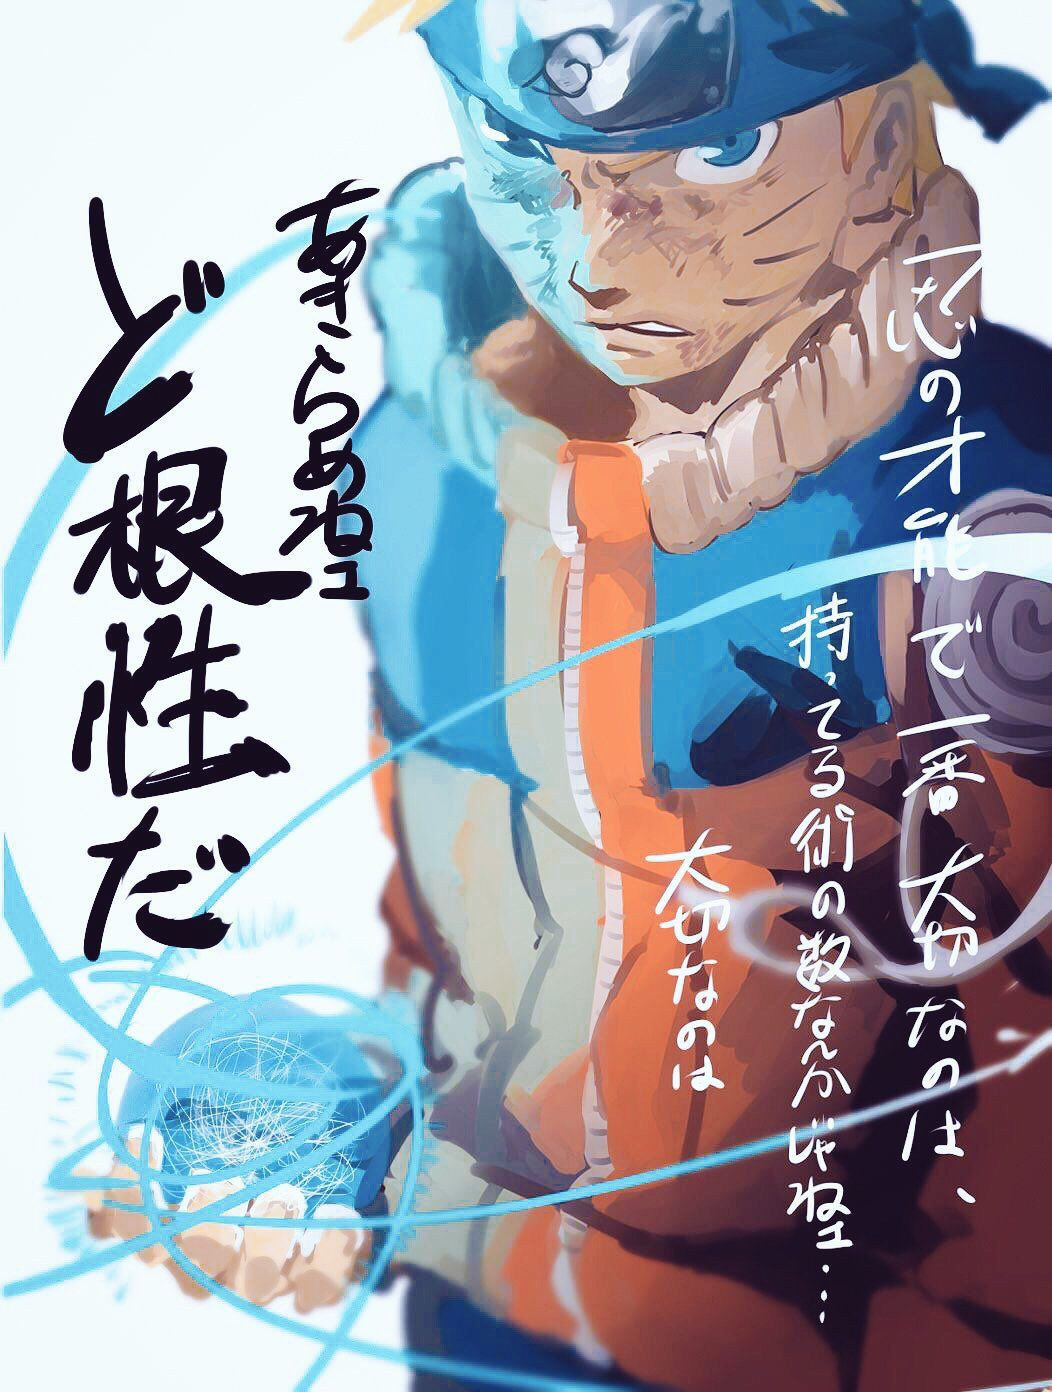 Nar And Shin Is My Hero の画像 投稿者 Tuyền Nguyễn さん